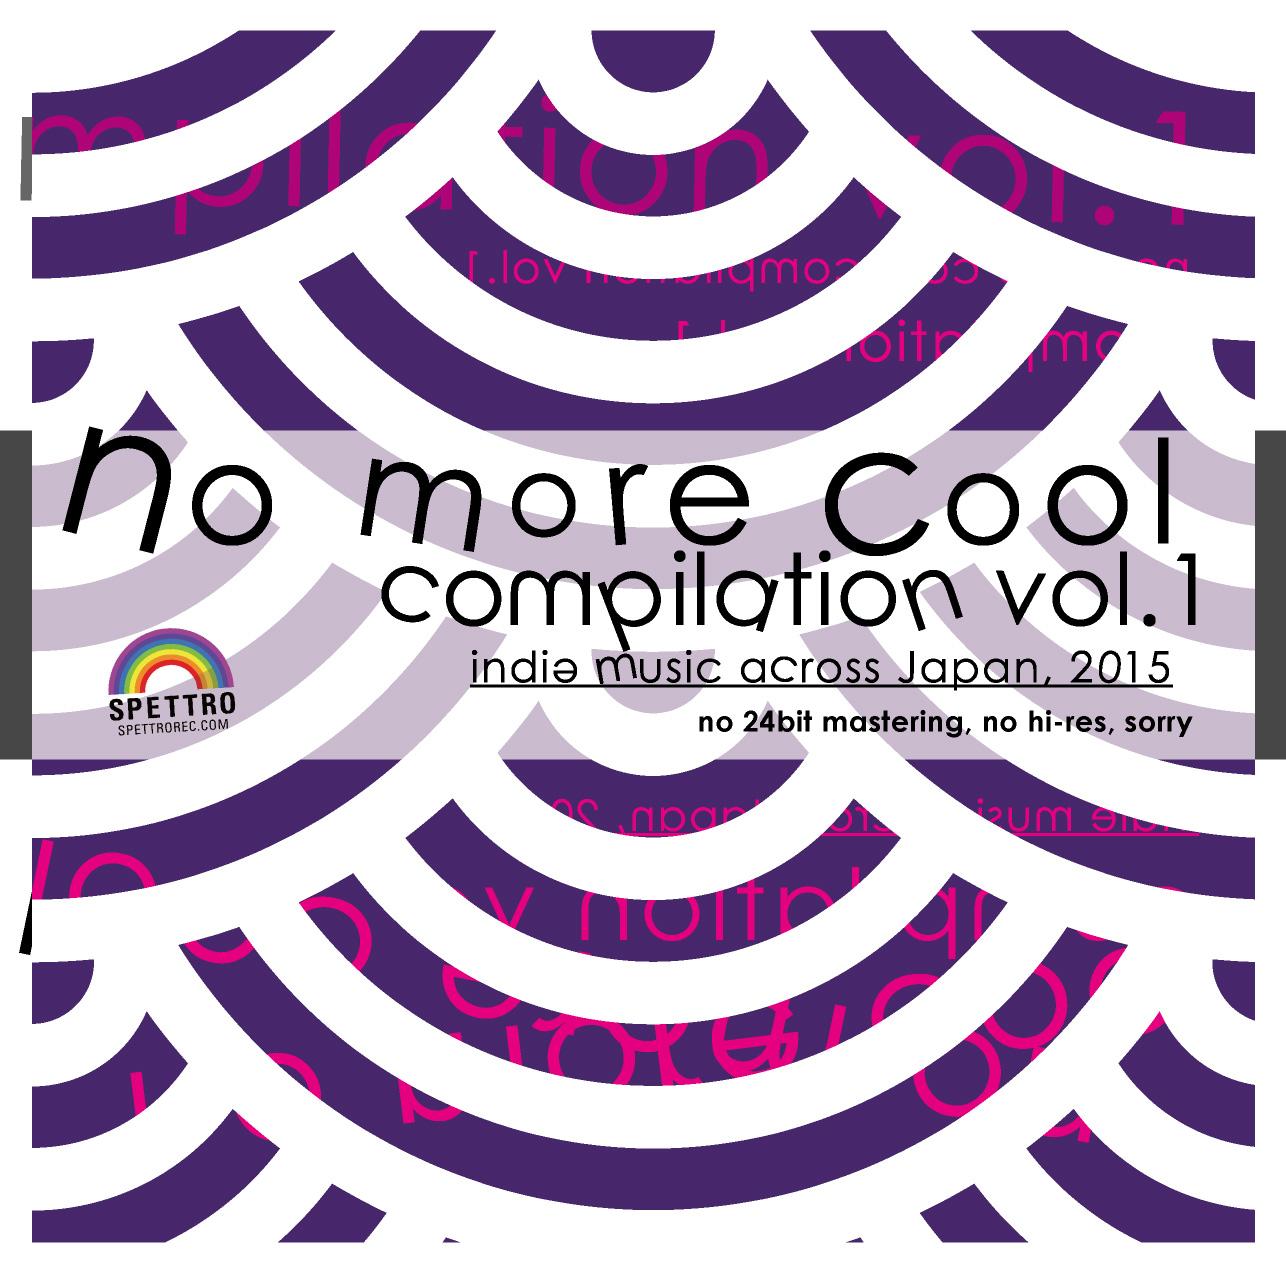 no more cool compi 01